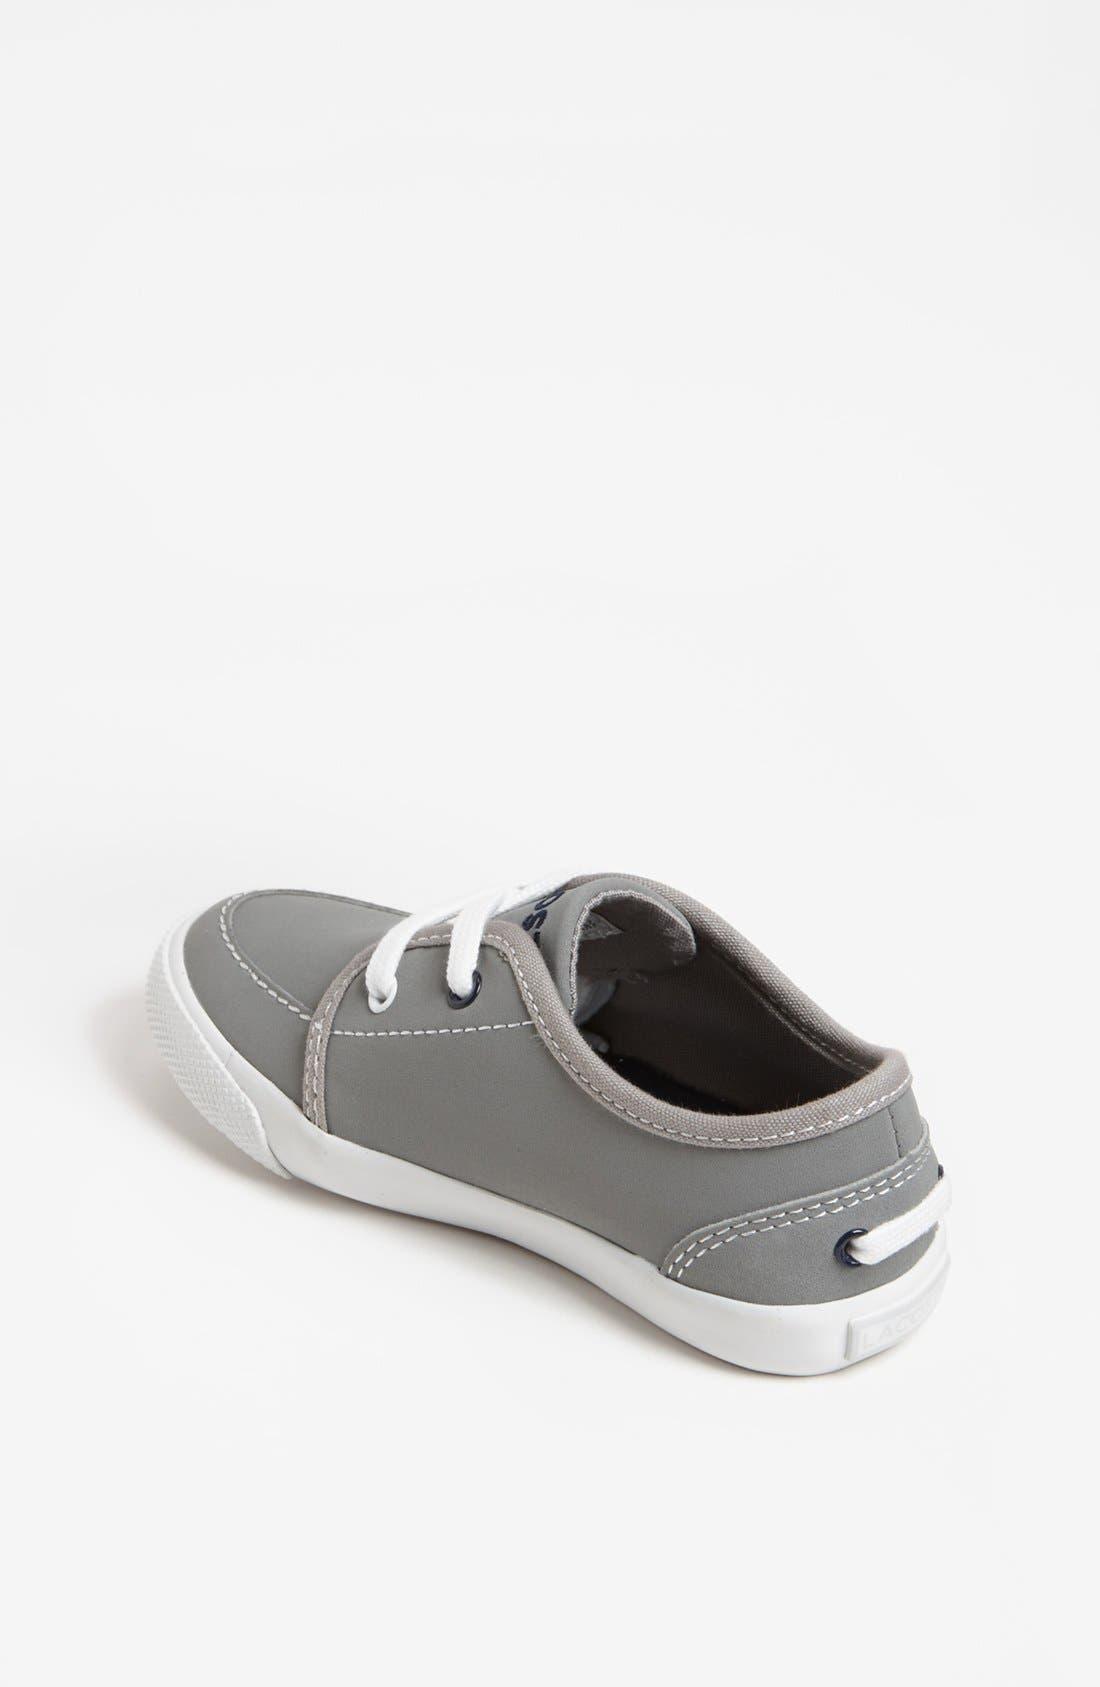 Alternate Image 2  - Lacoste 'Boat DE' Sneaker (Toddler)